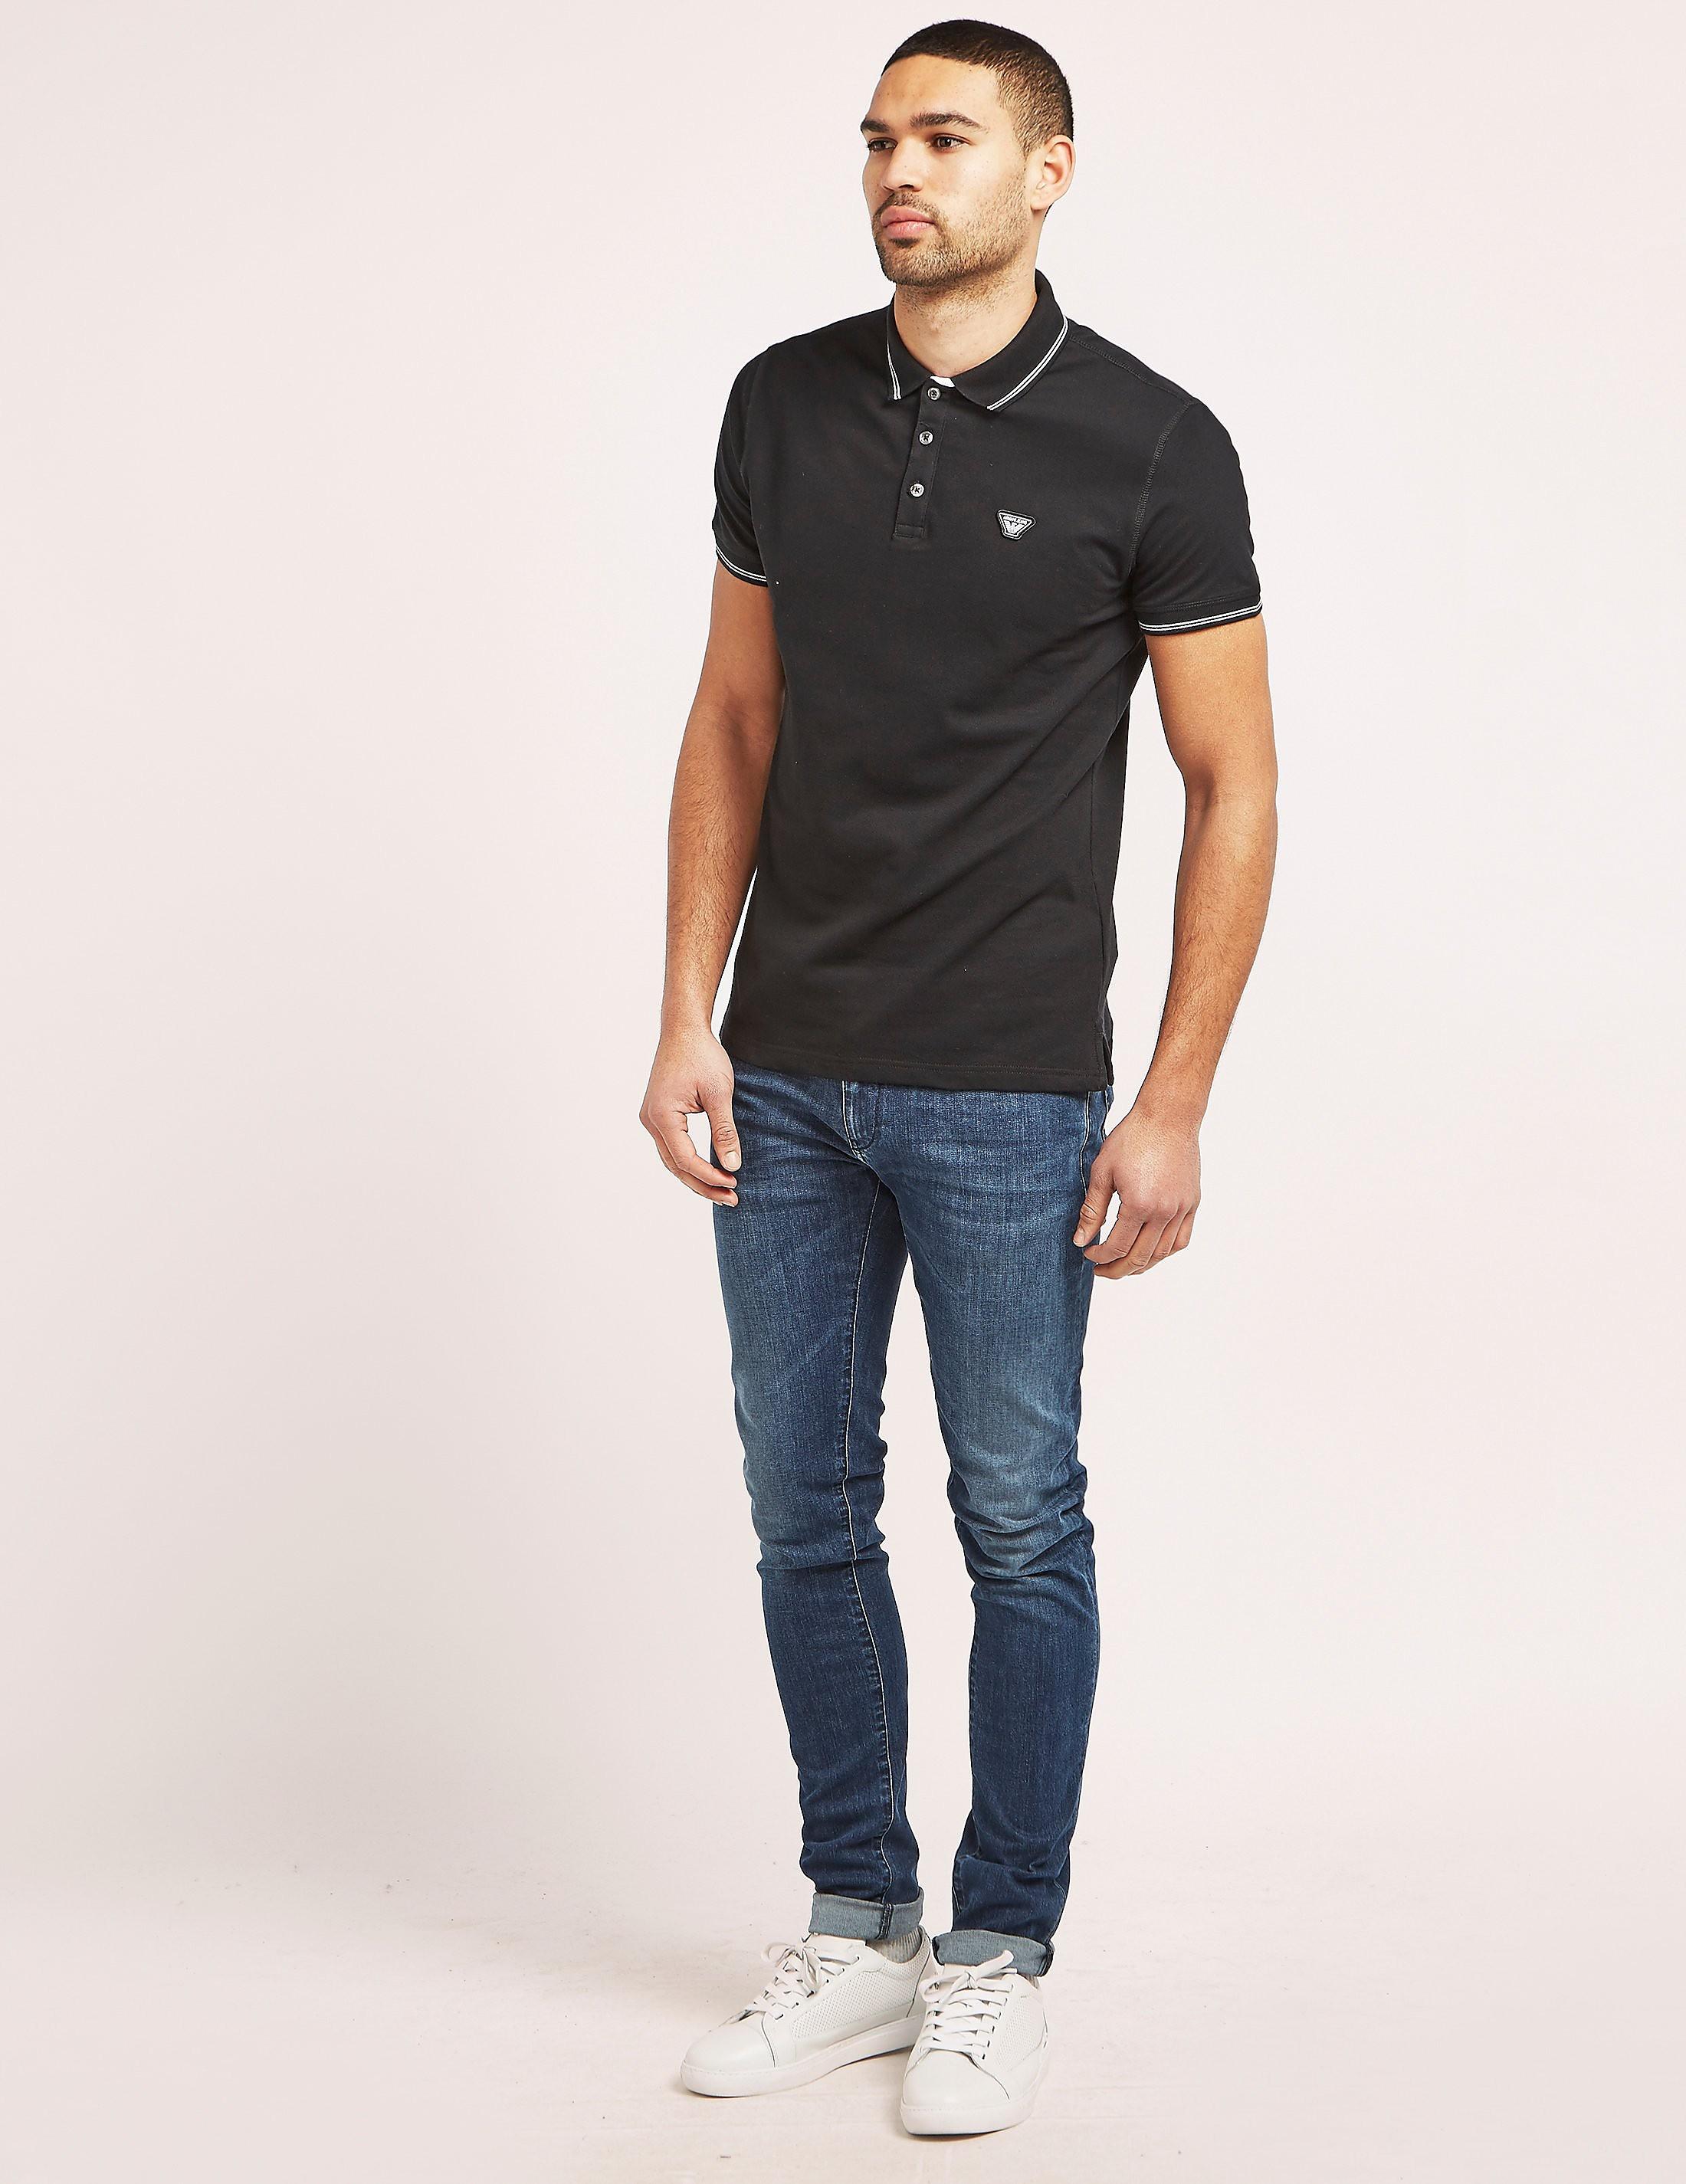 Armani Jeans J10 Super Slim Jeans